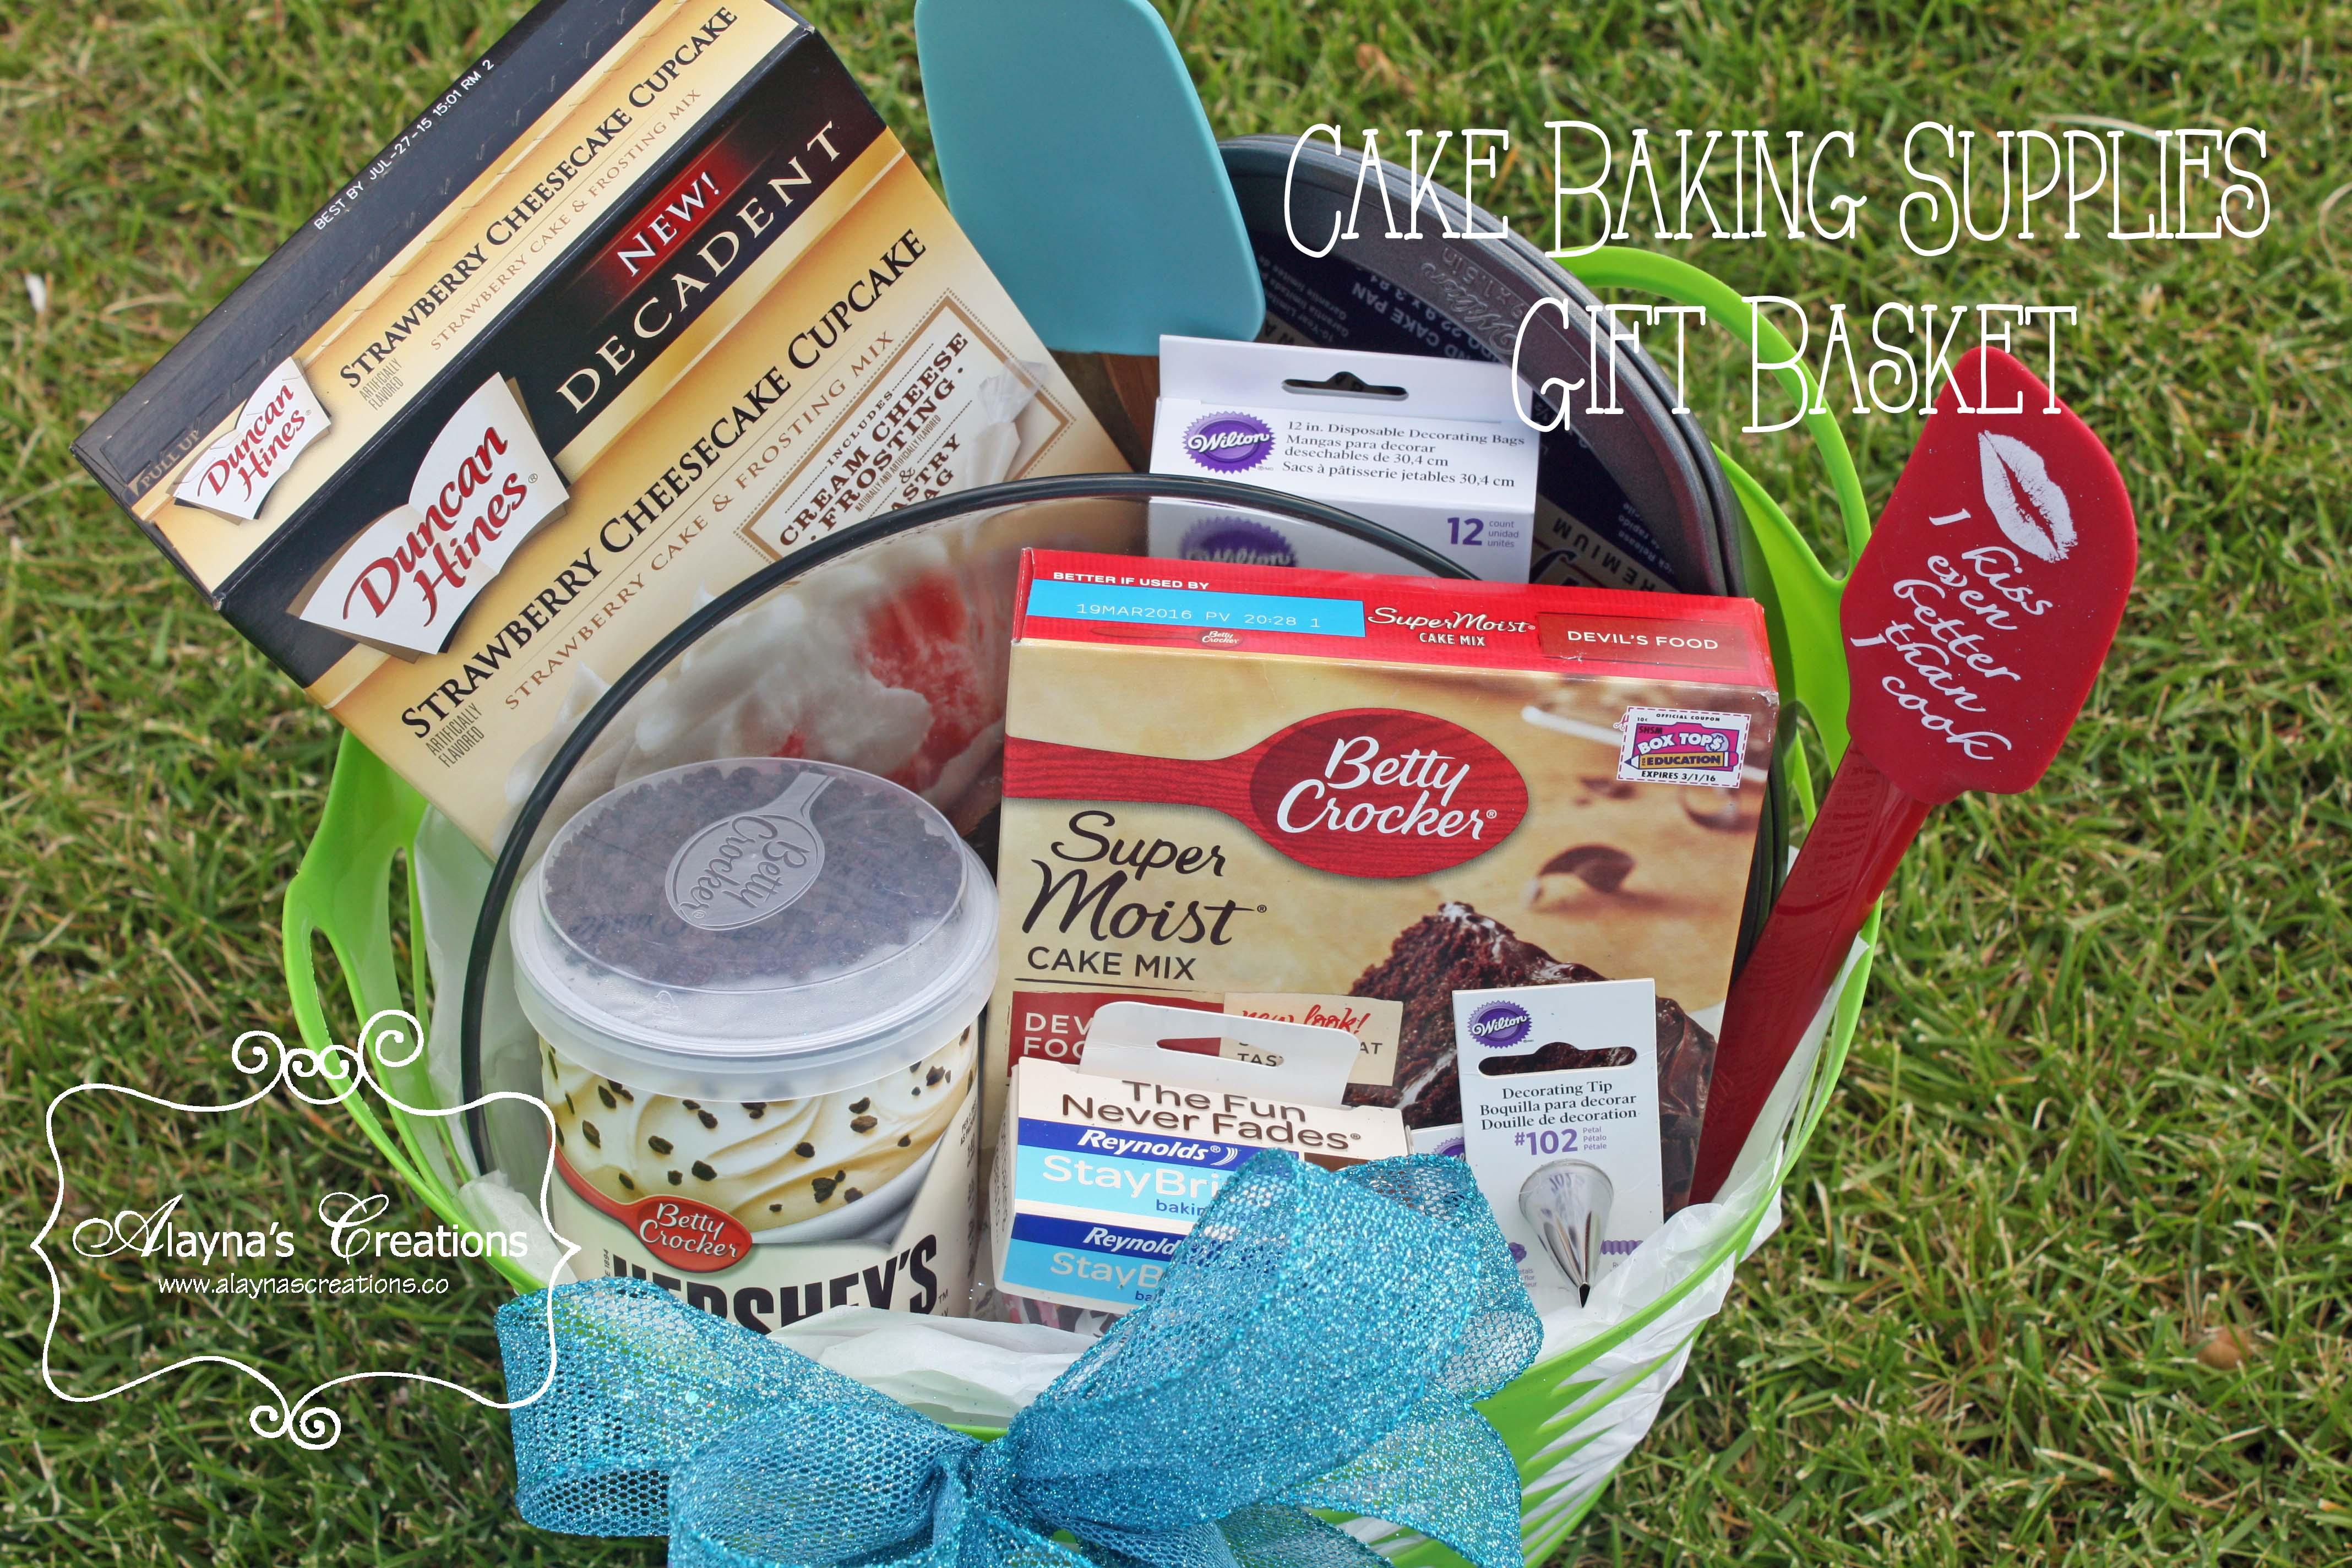 cake baking gift basket Archives - DIY home decor and crafts